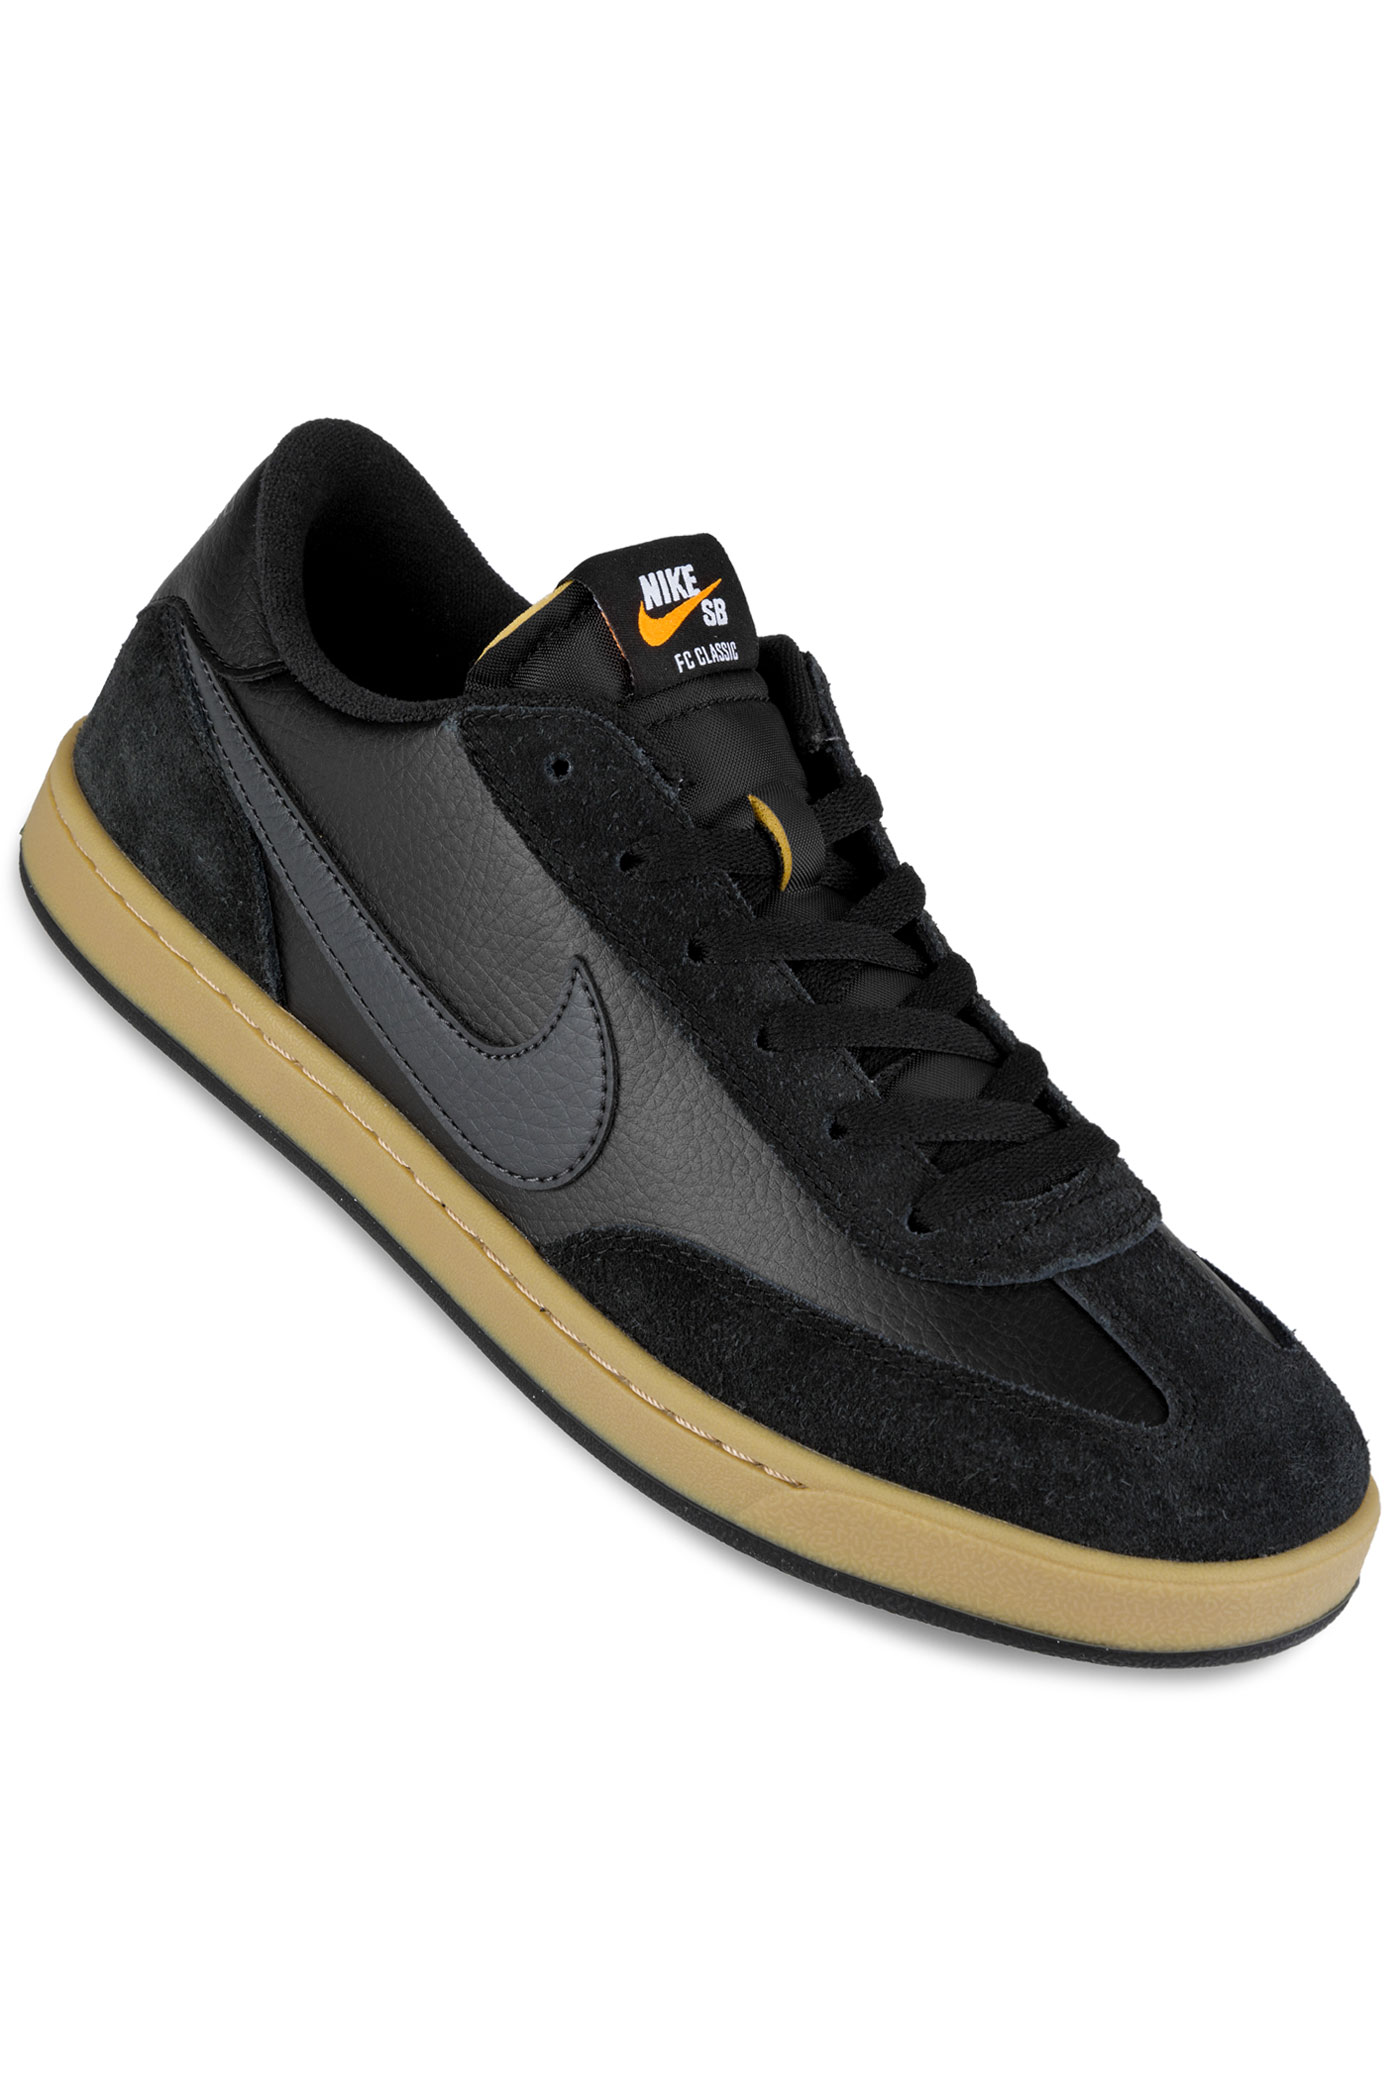 nike sb fc classic chaussure black anthracite achetez sur skatedeluxe. Black Bedroom Furniture Sets. Home Design Ideas